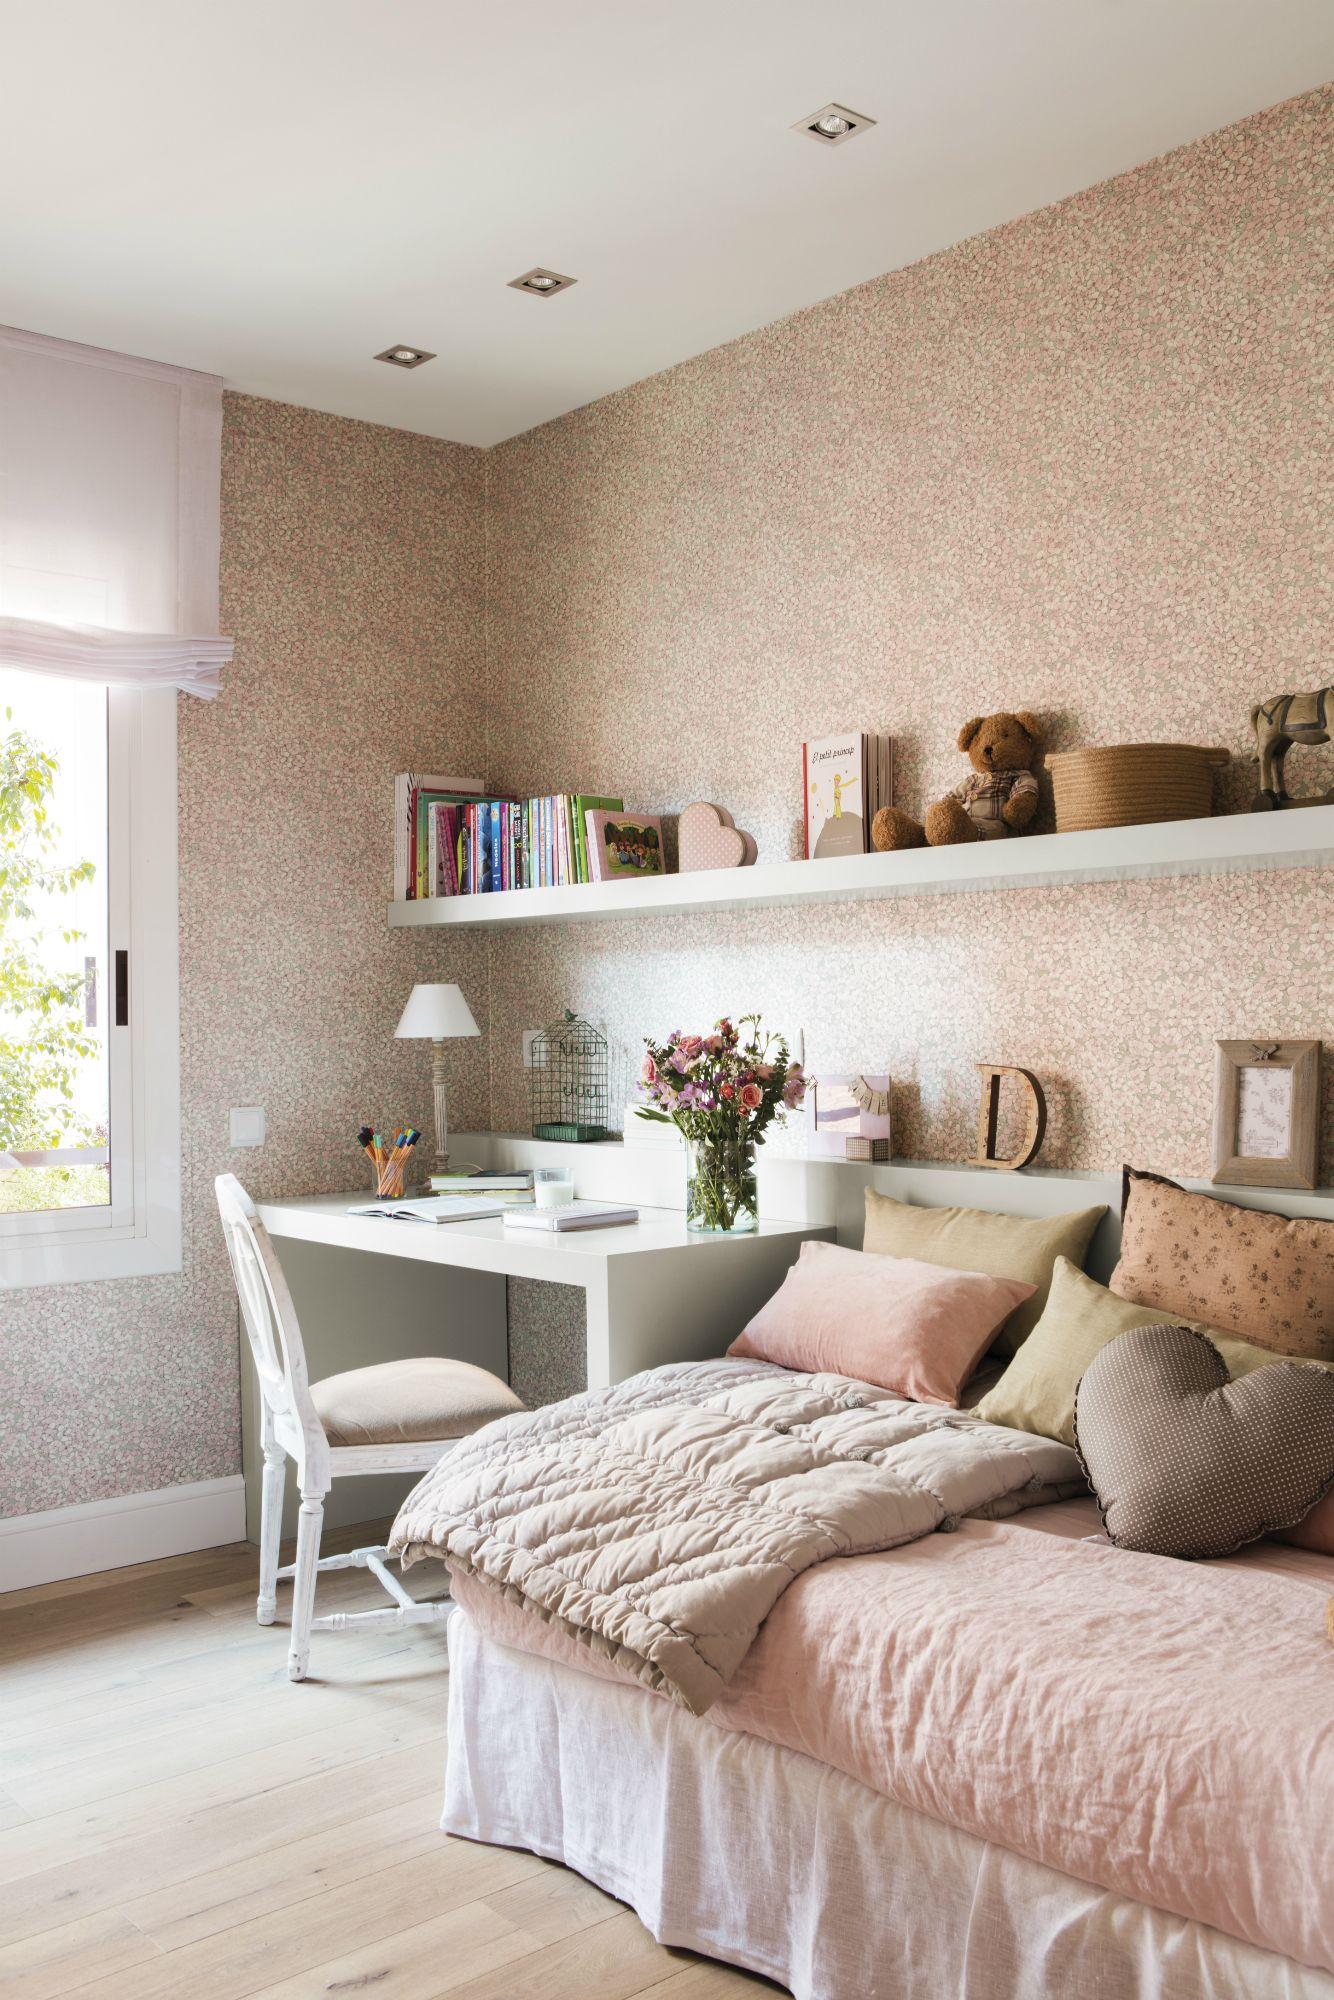 Veces pineada en 2019 habitaci n ni a - Decoracion de paredes de dormitorios juveniles ...